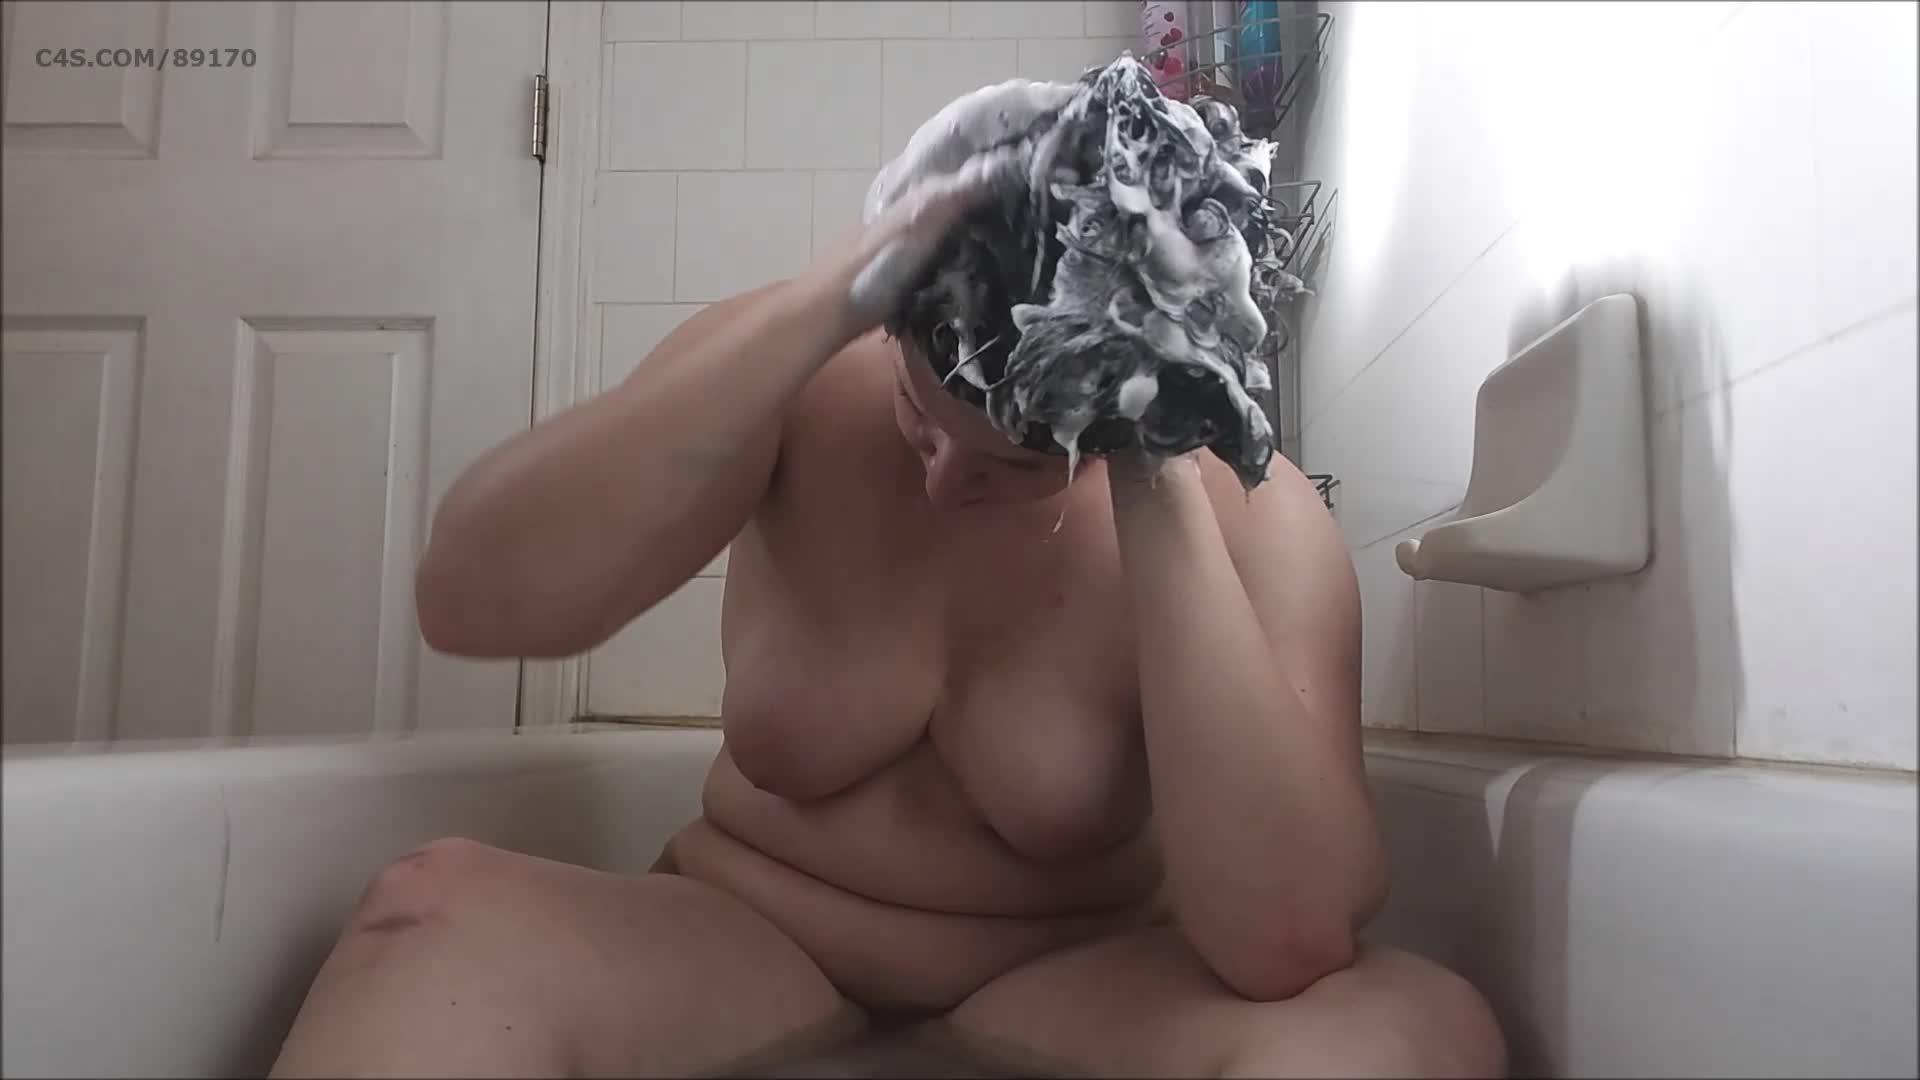 Booty4U's vid